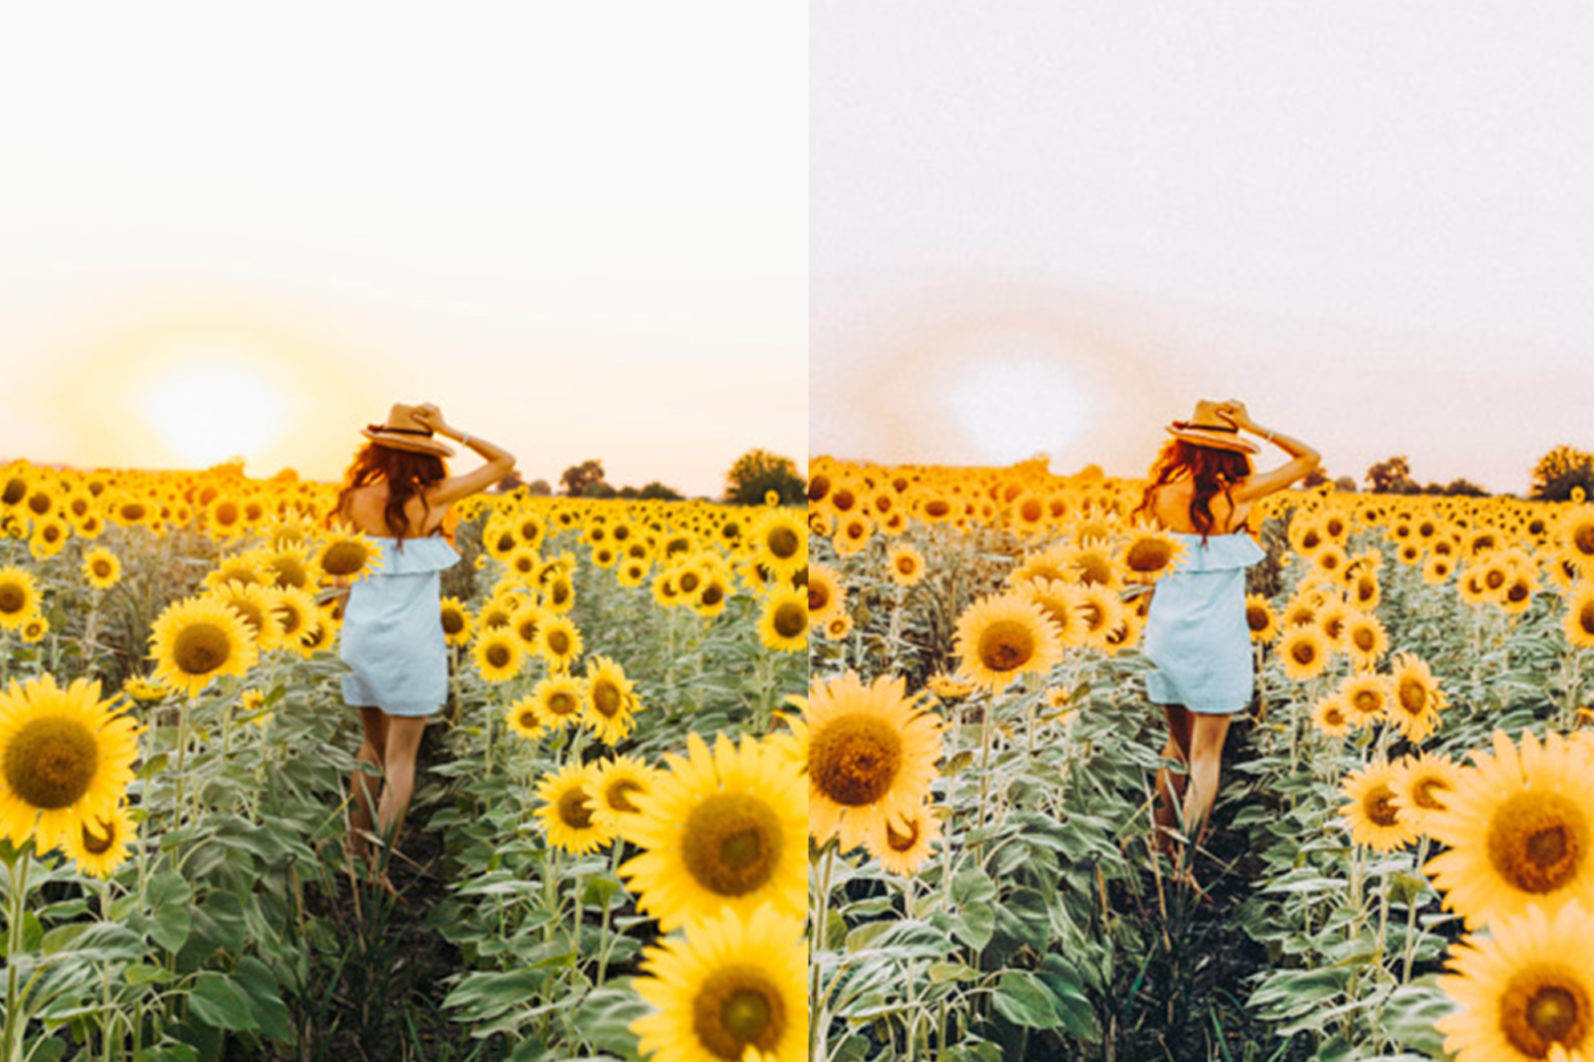 12 x Sunflower Fields Lightroom Presets   Warm Lightroom Presets   Yellow Presets - 7 Sunflower Fields -